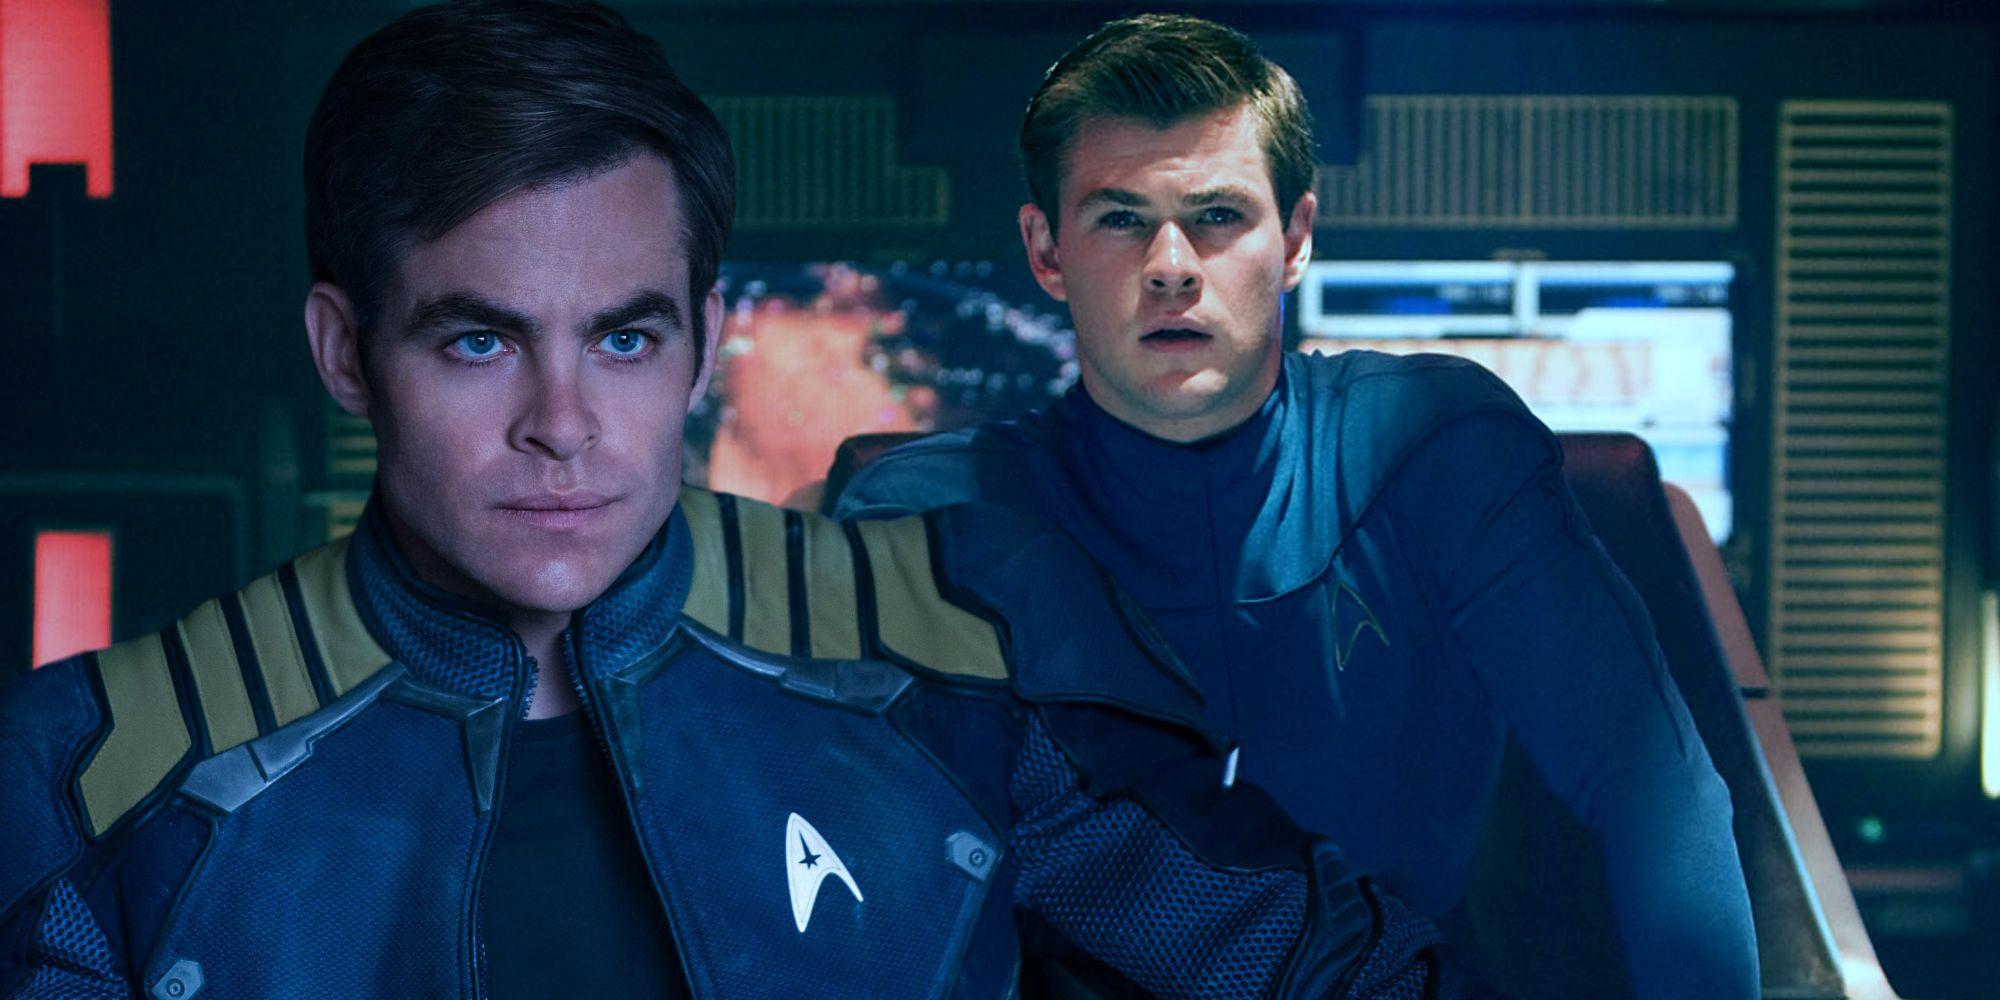 Star Trek 4 Chris Pine